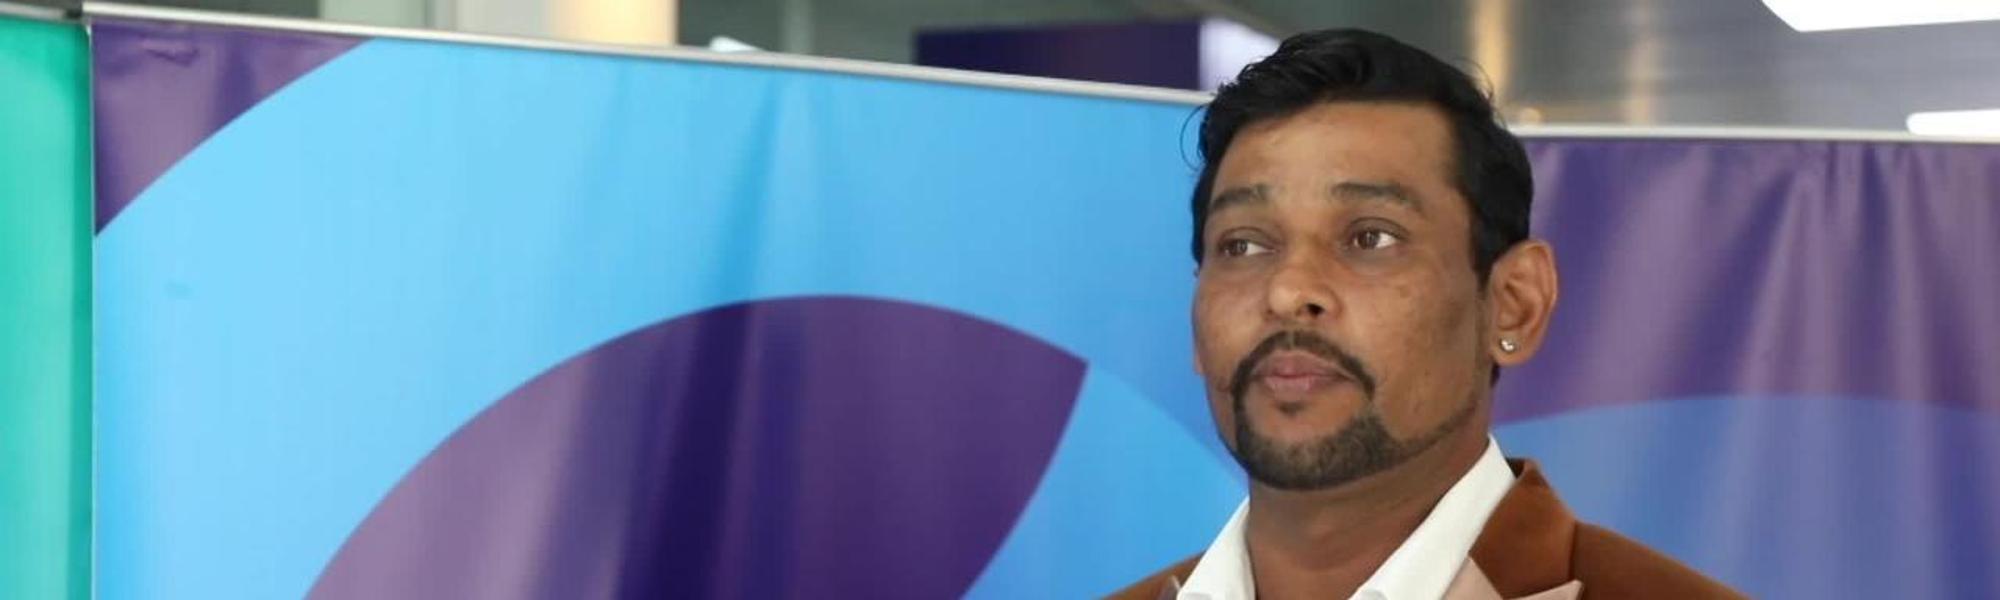 Former Sri Lanka star Tillakaratne Dilshan showed up for the CWC Nissan Trophy Tour